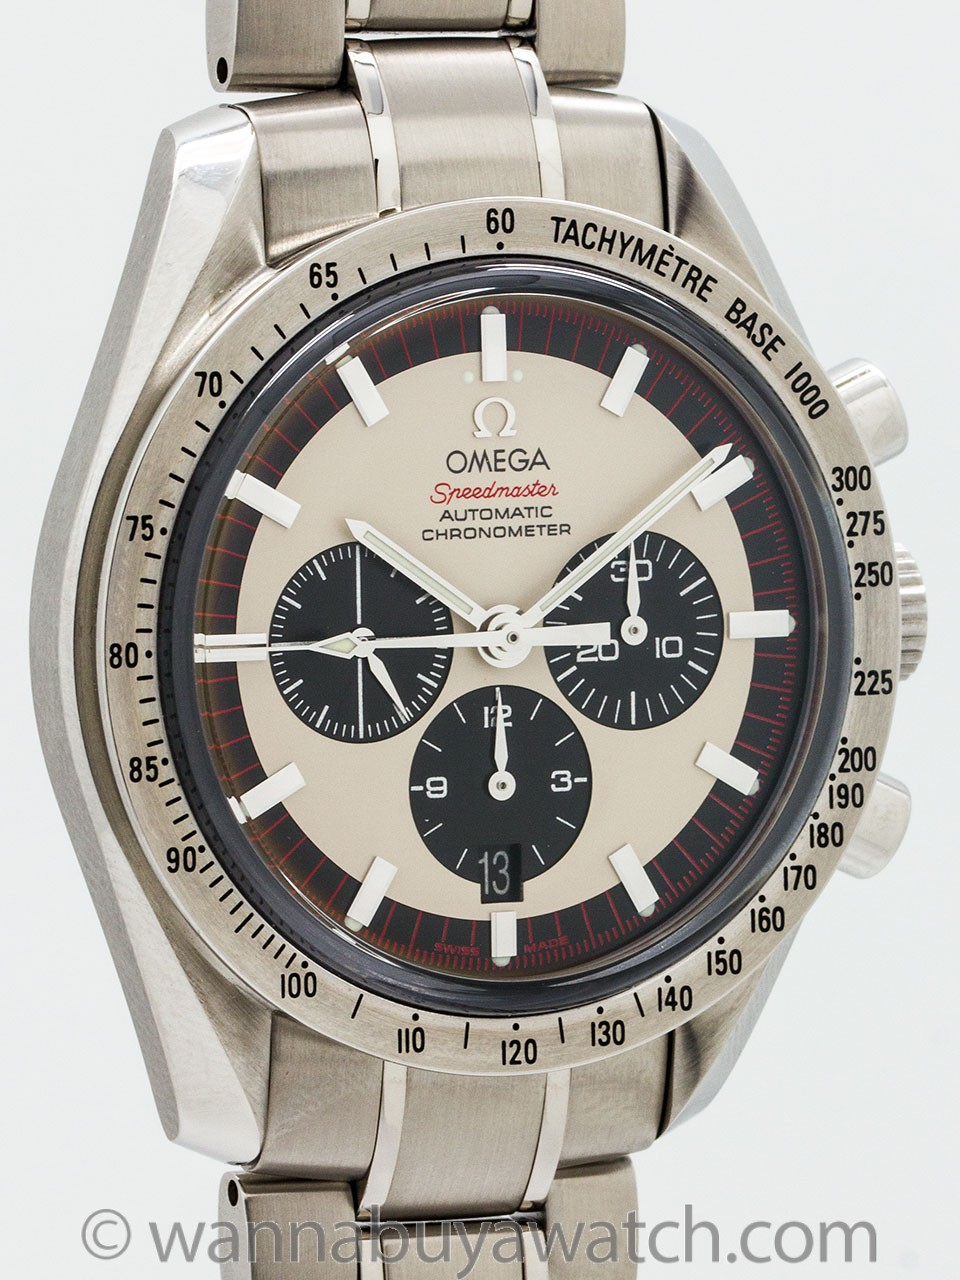 Omega Speedmaster Michael Schumacher The Legend circa 2004